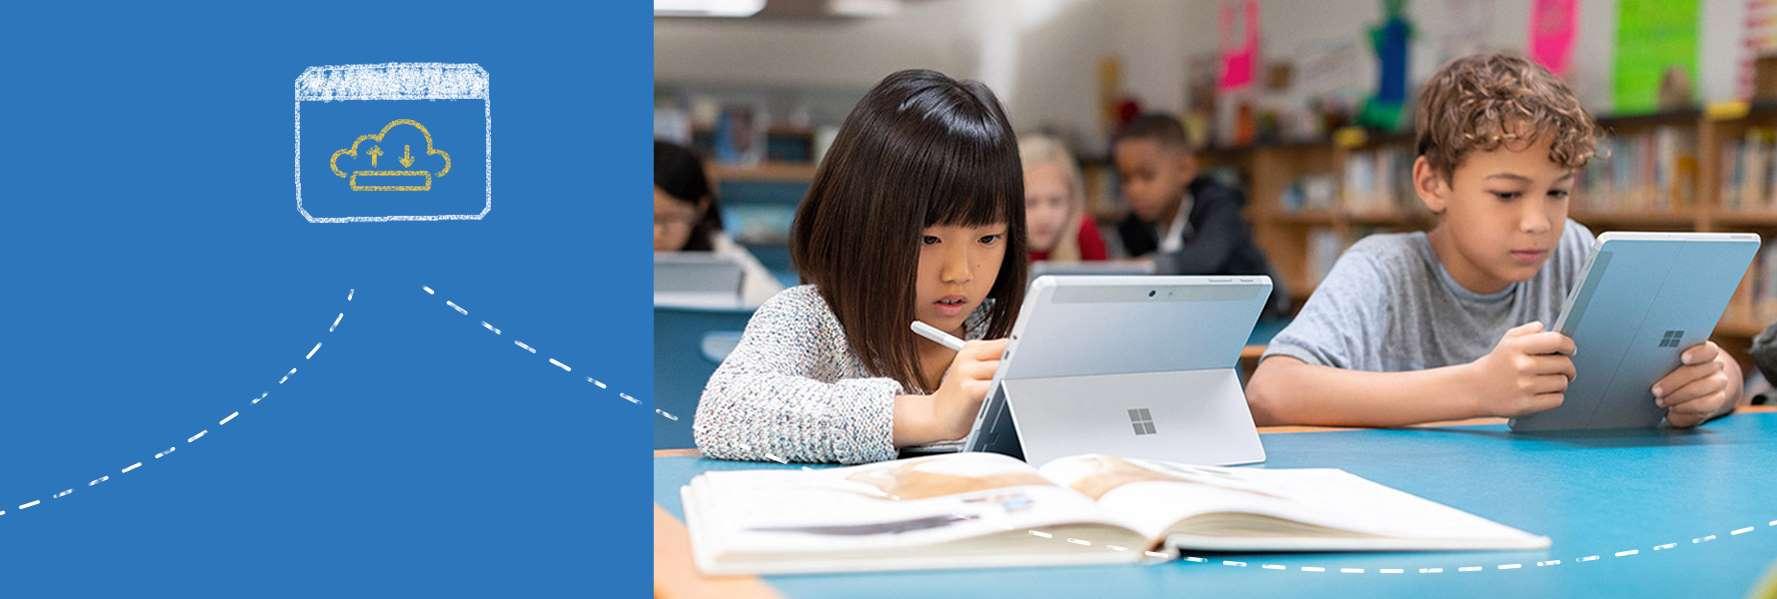 MetaComp Microsoft Anwendungen Intune for Education